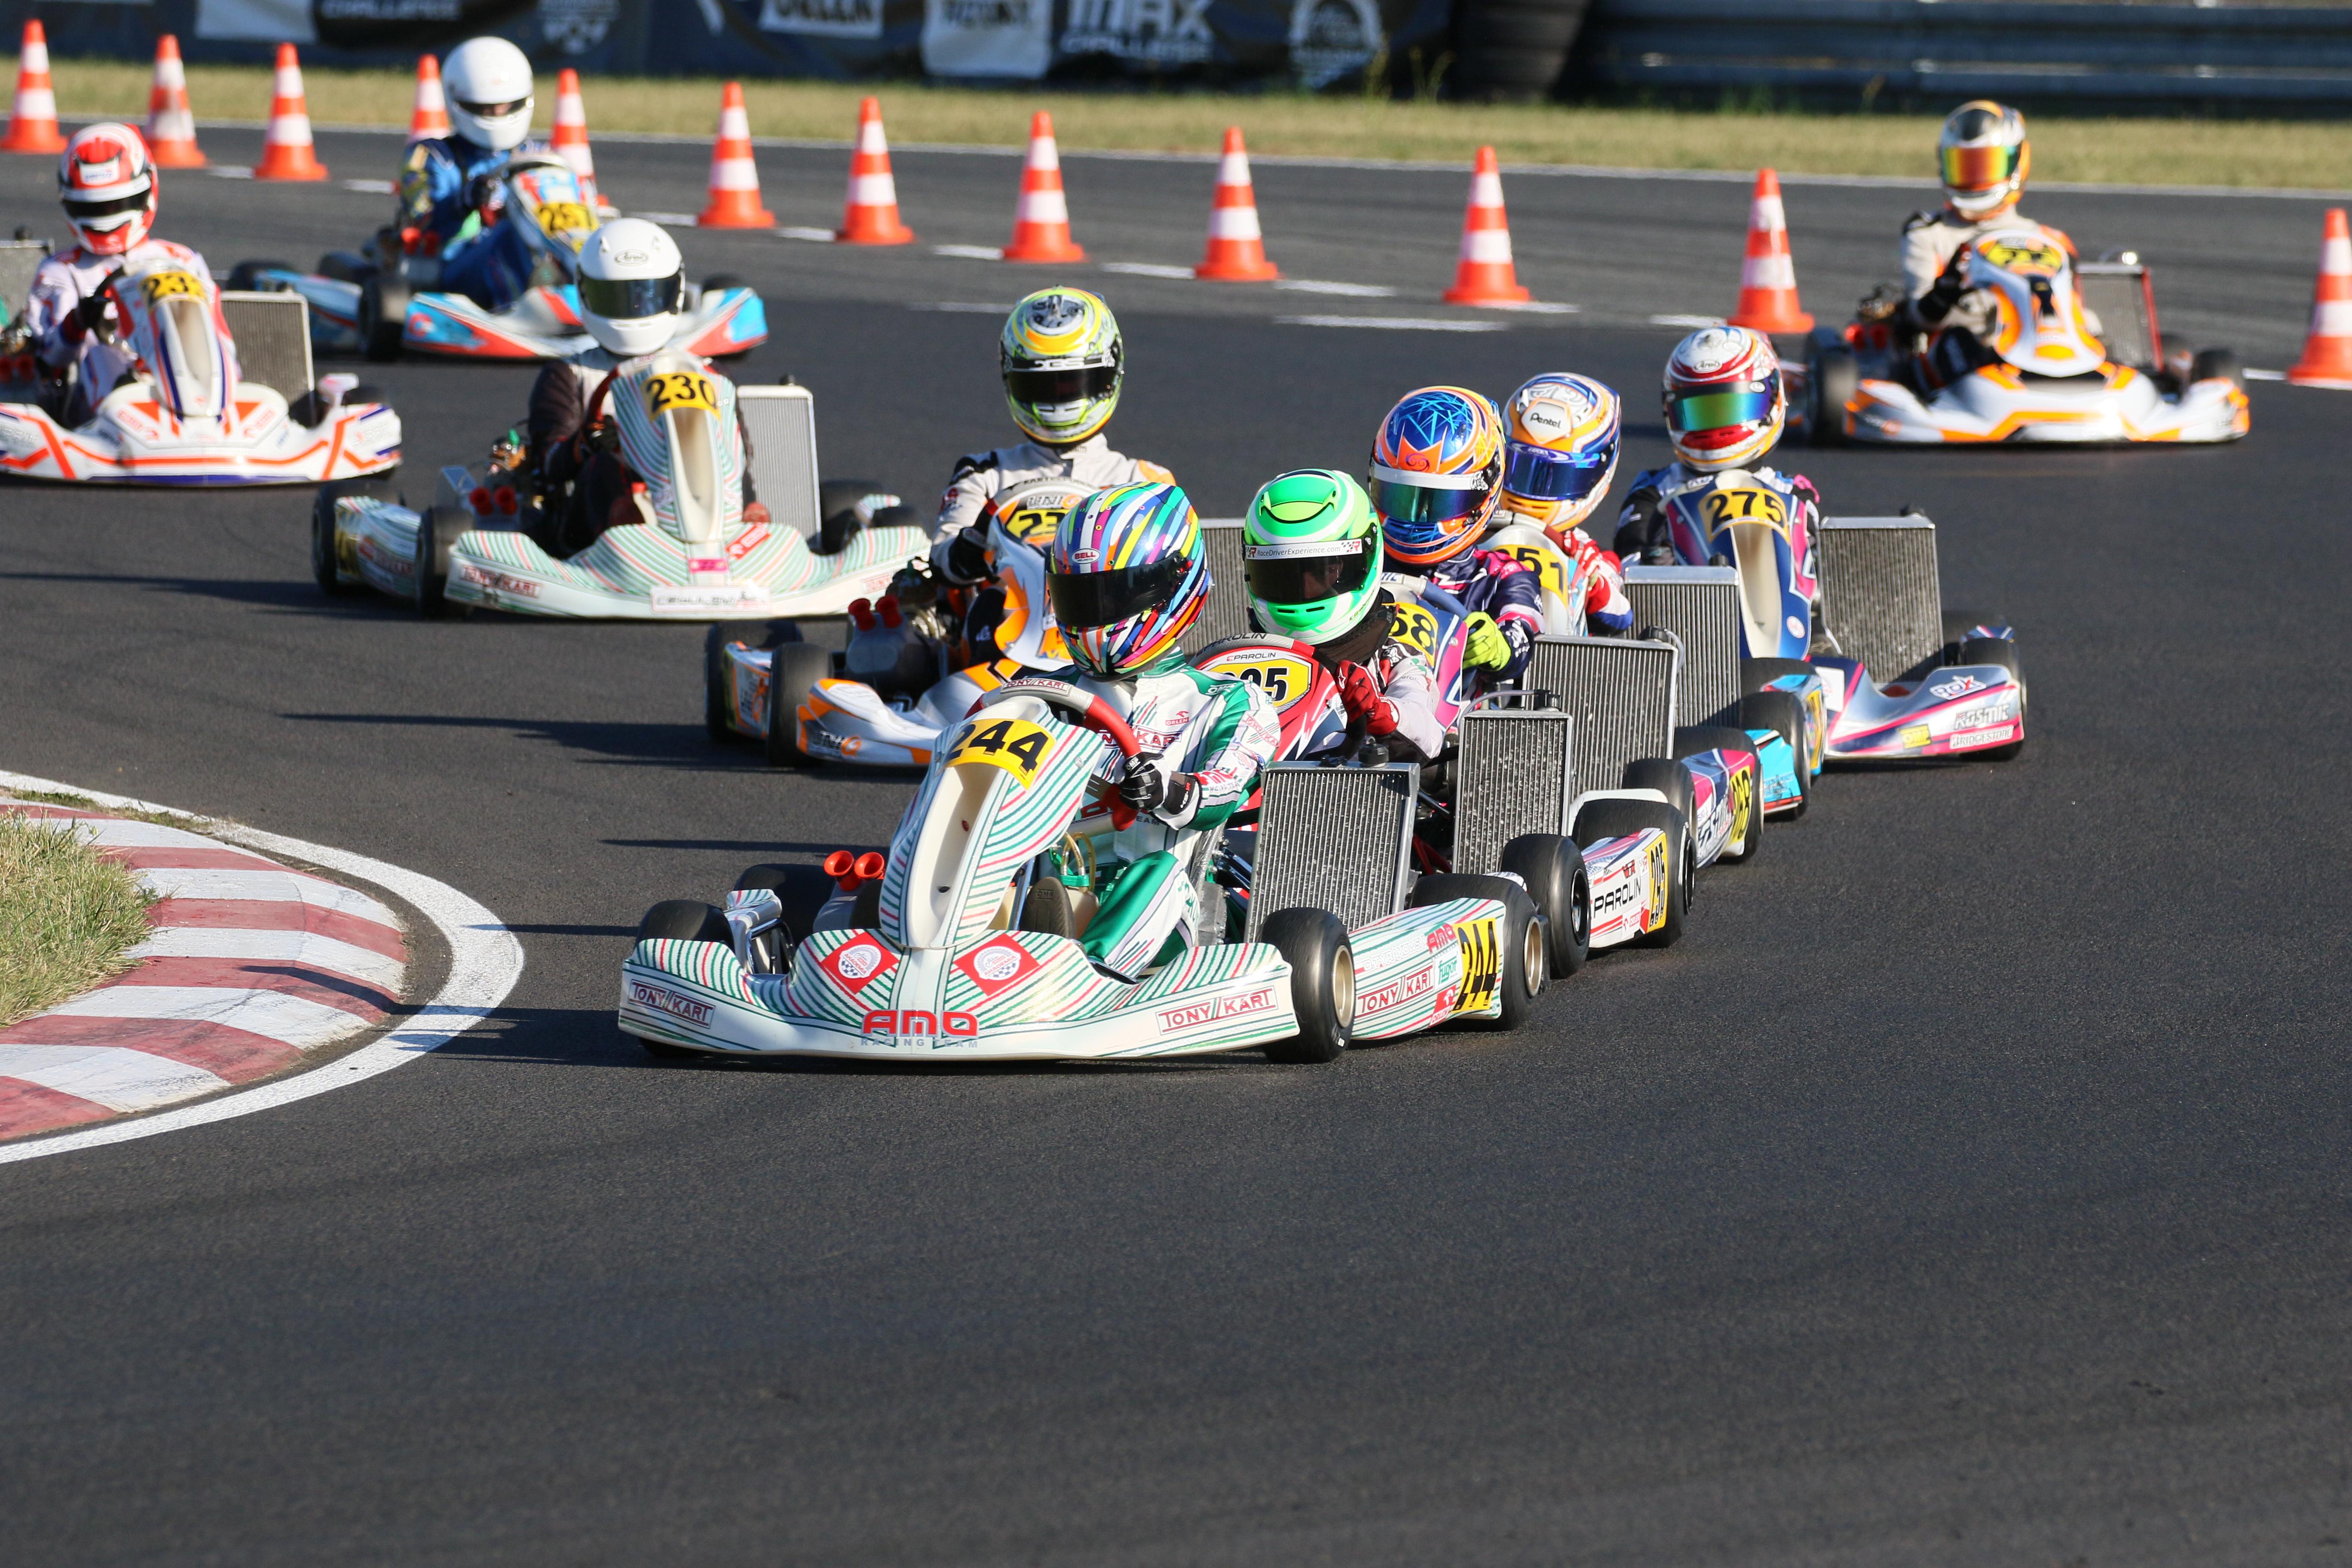 Olaf Tyrakowski - Senior Rok GP